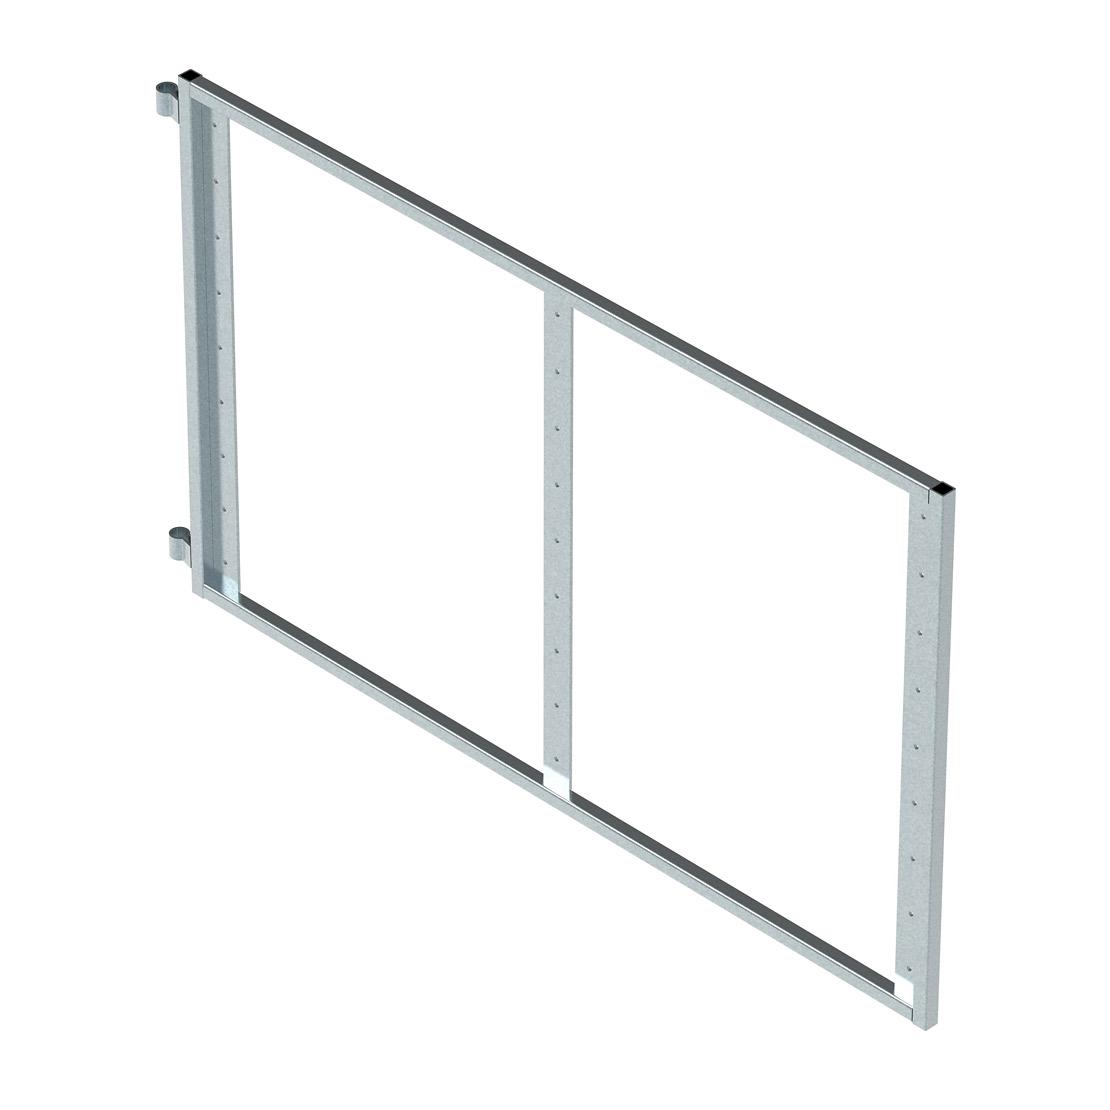 Sheepyard gate 1400mm x 850mm (frame only)